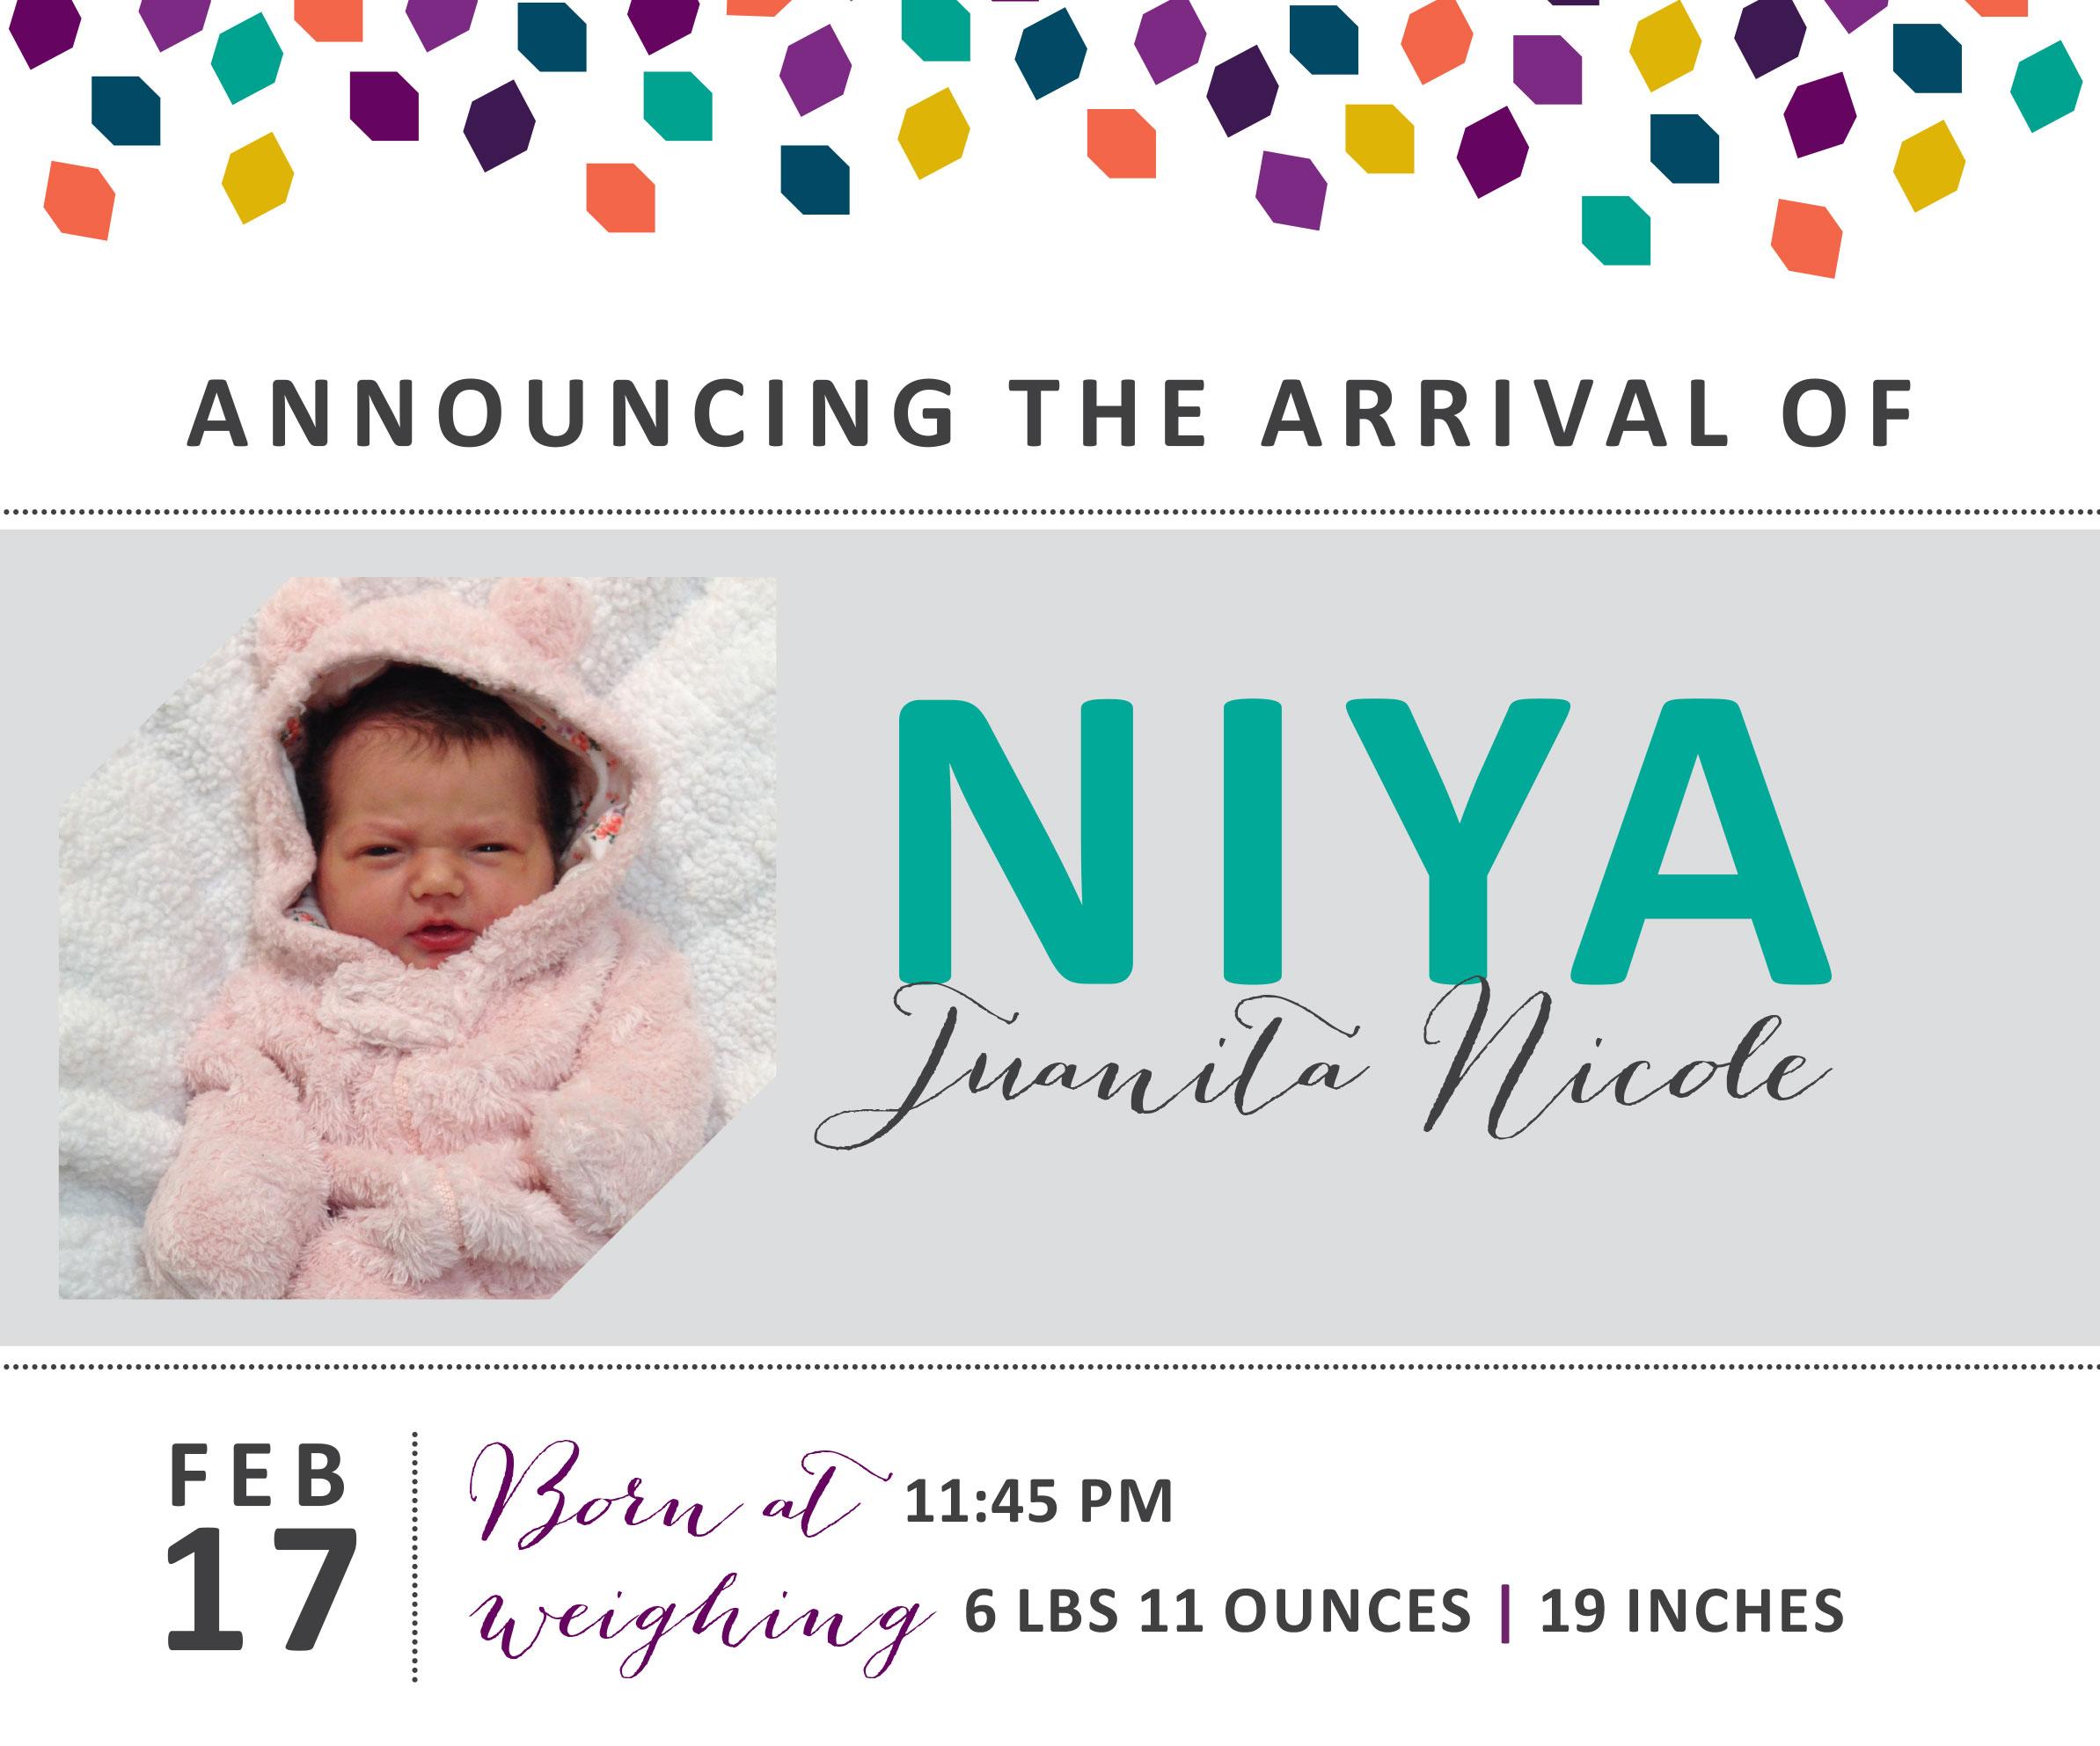 Niya Juanita Nicole 3